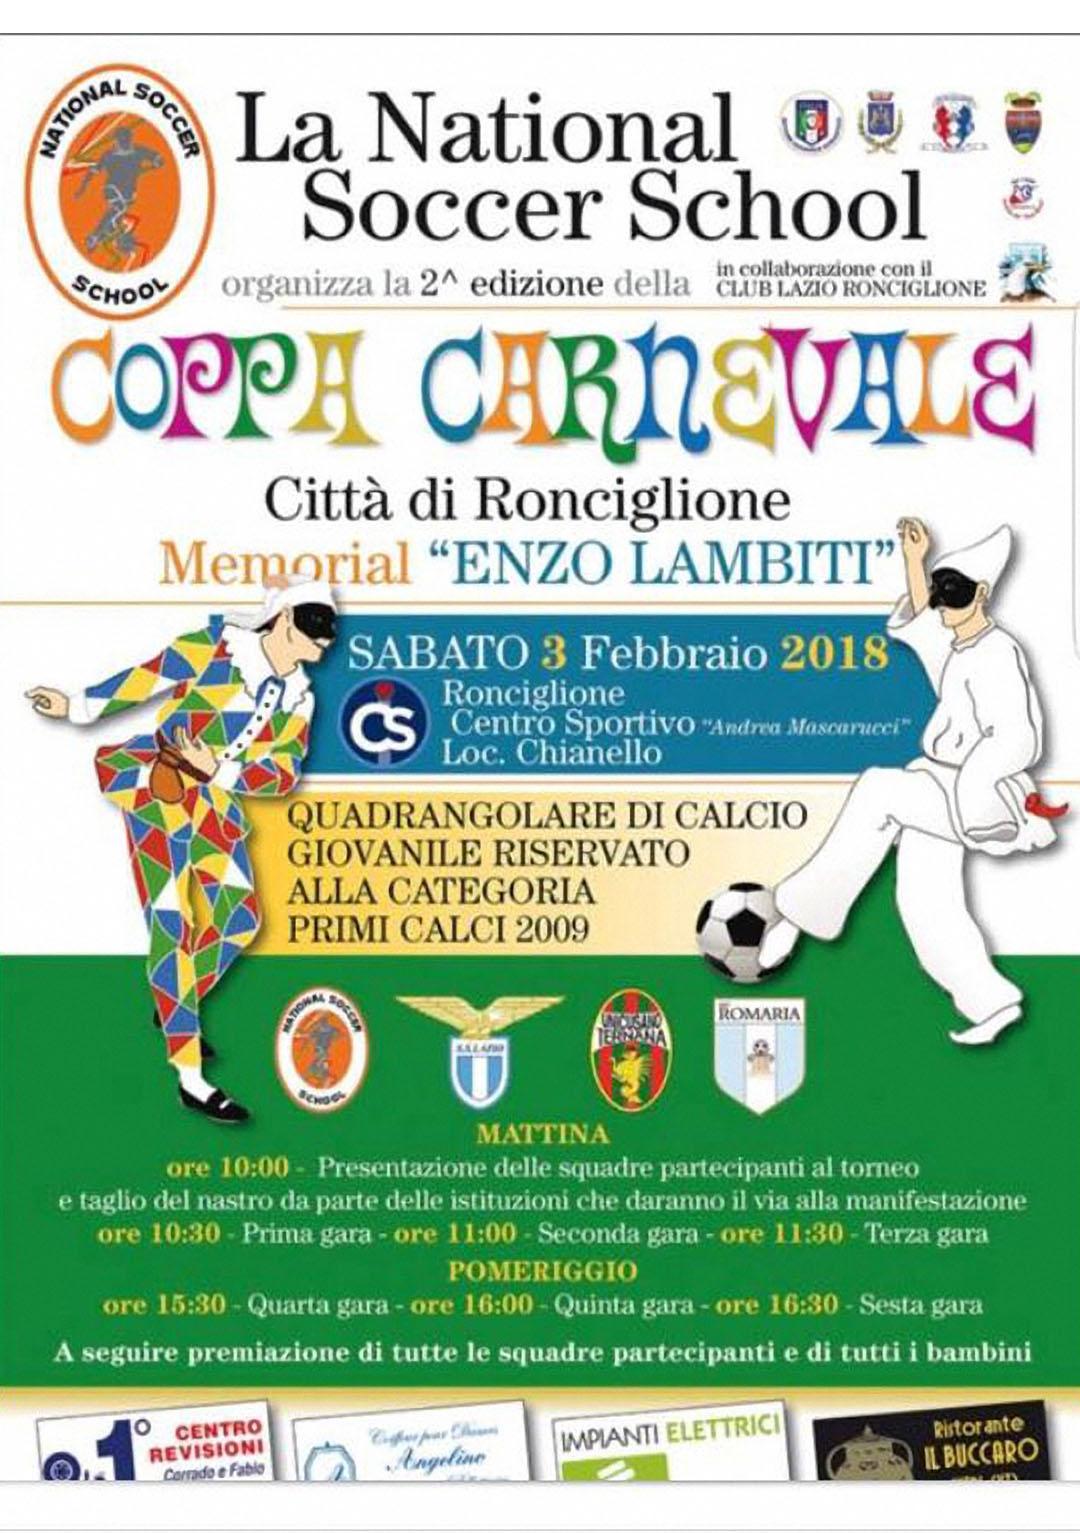 Coppa Carnevale